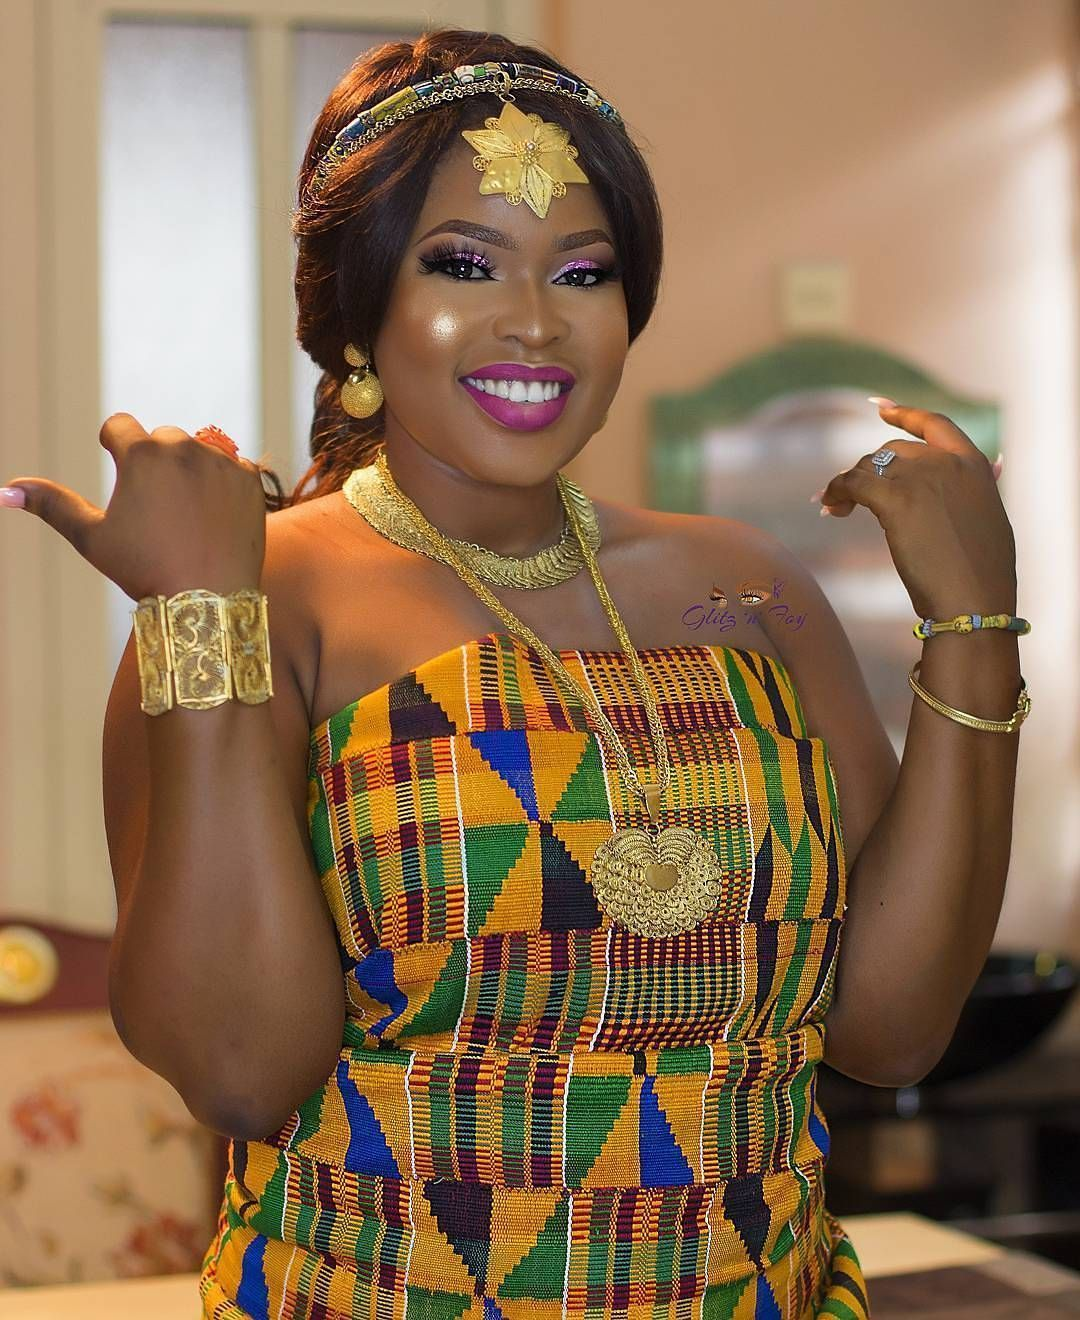 Ghanaian bride nezzamarley Makeup glitz_n_foy